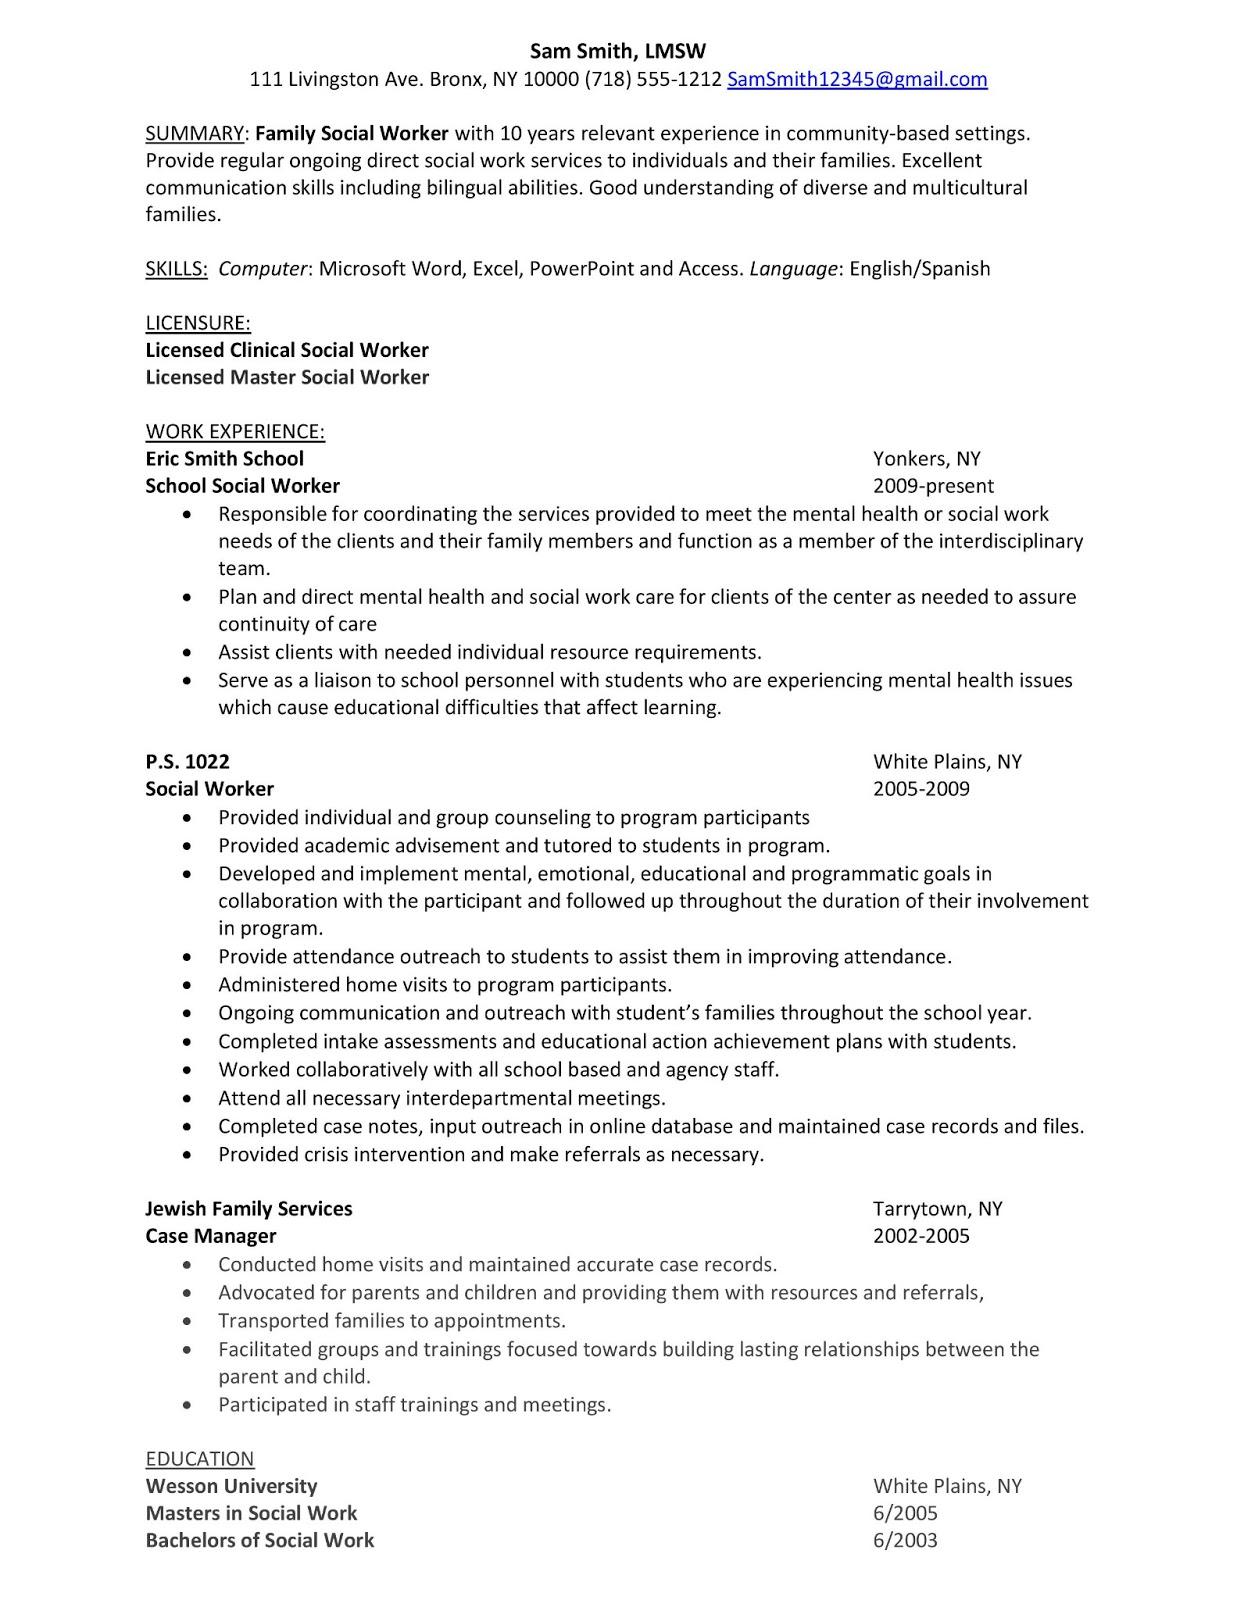 Cv Format Youth Worker Sample Counselor Cv Counselor Cv Formats Templates Lcjs Sample Resume Family Social Worker